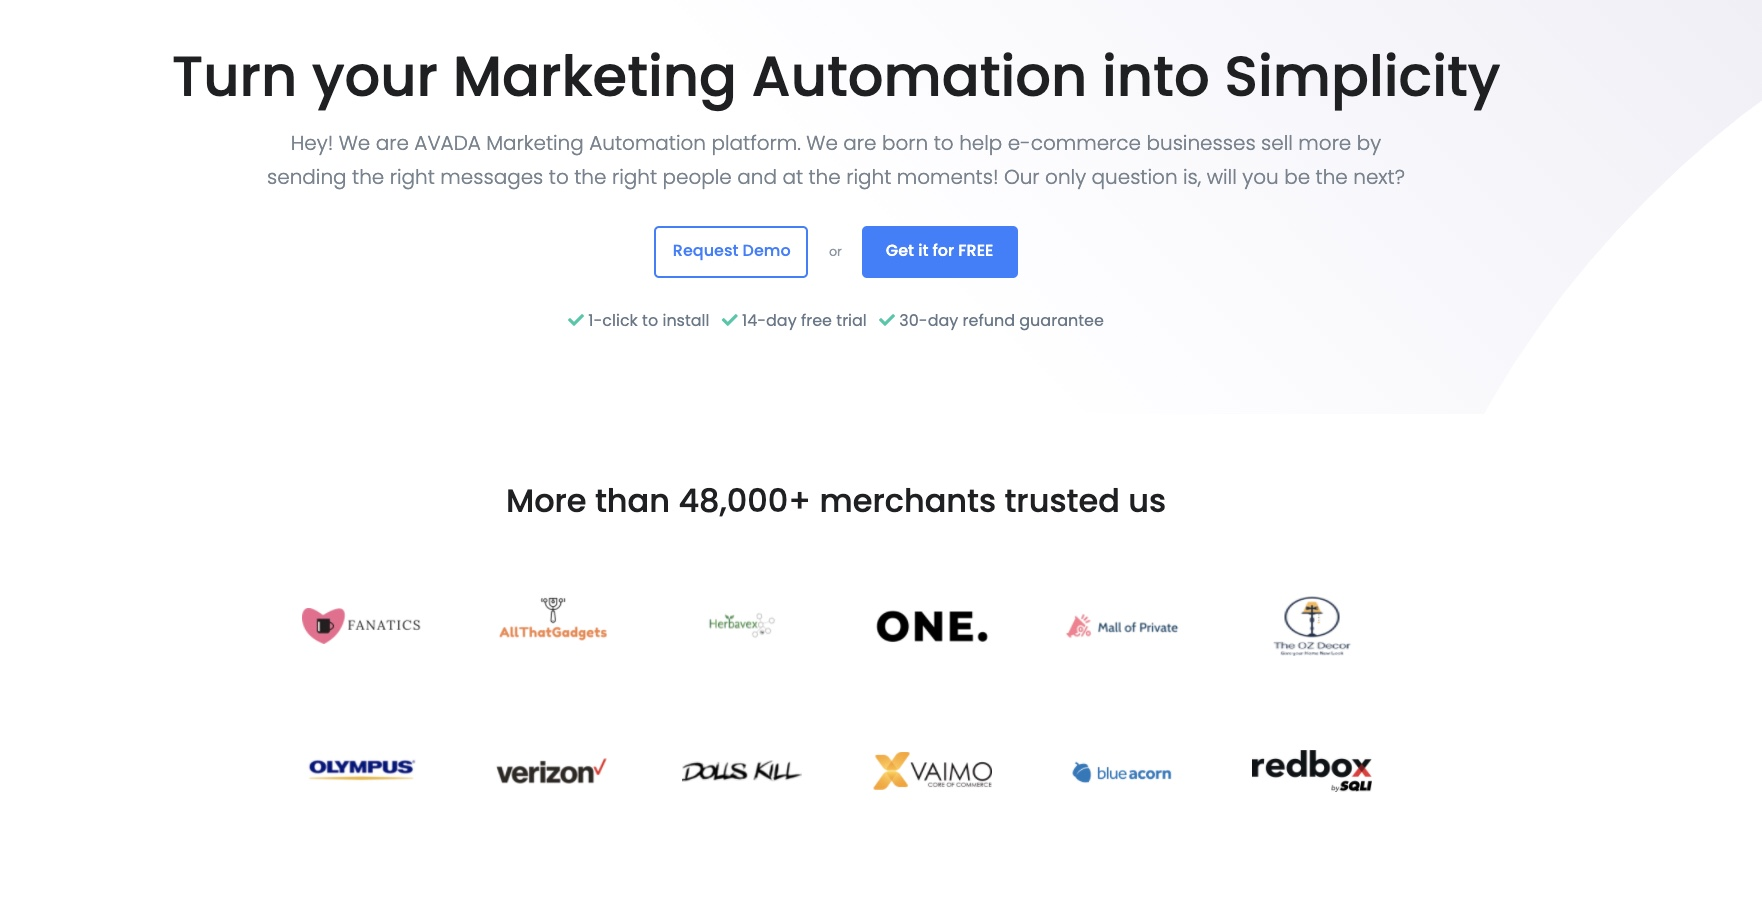 AVADA Email Marketing Automation